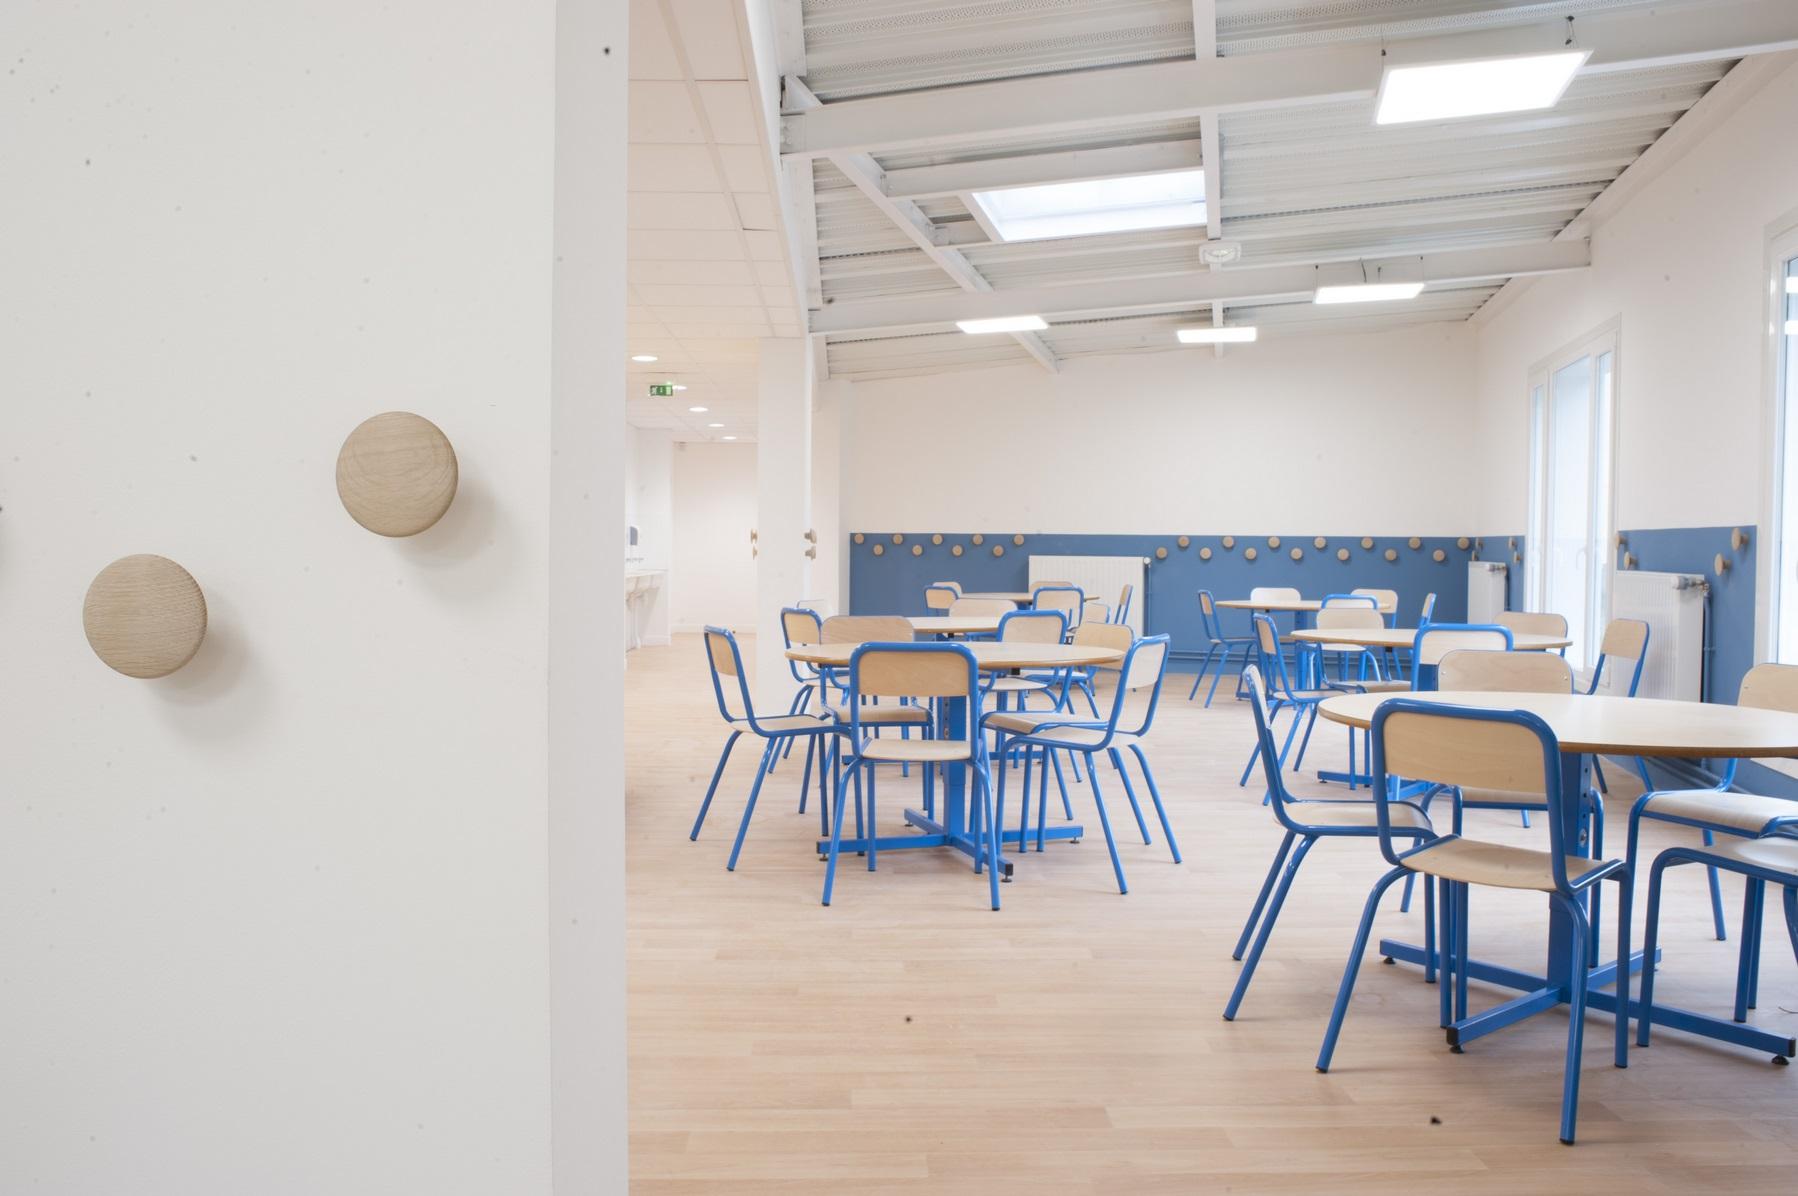 Groupe scolaire Emile Serre - Neauphe-le-Chateau - Z Architecture